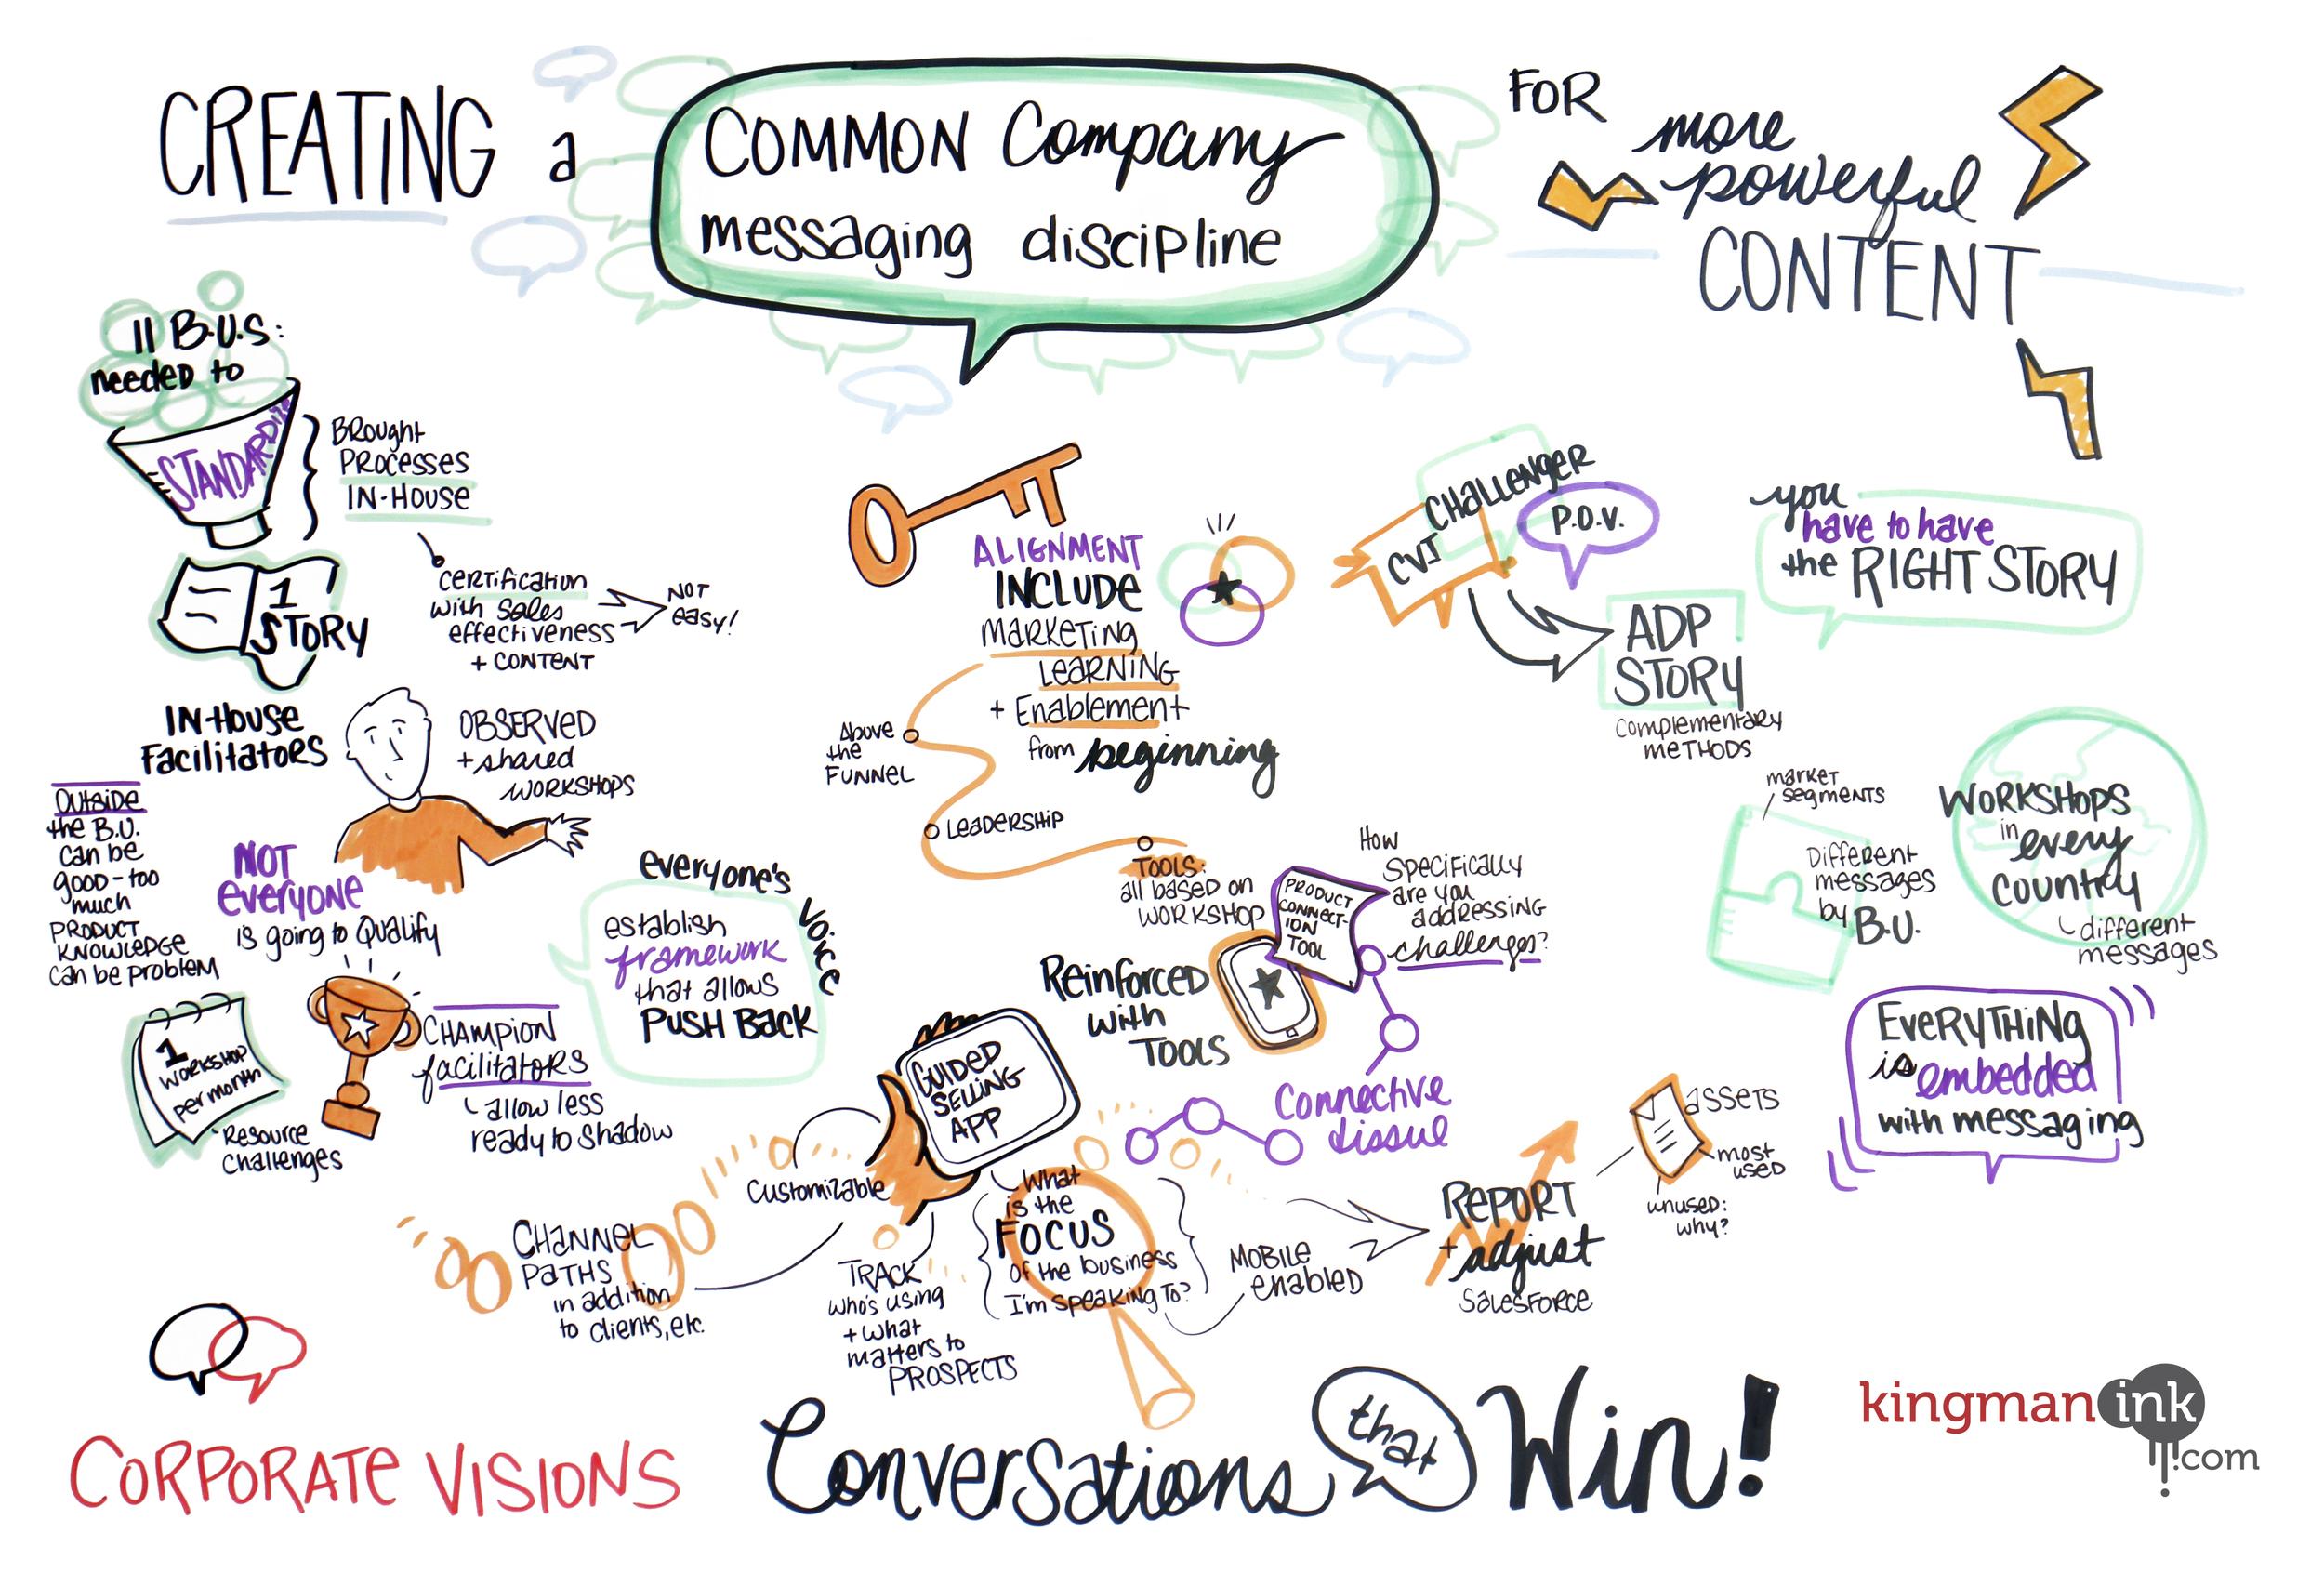 KingmanInk_CorporateVisions_CommonCompany.jpg